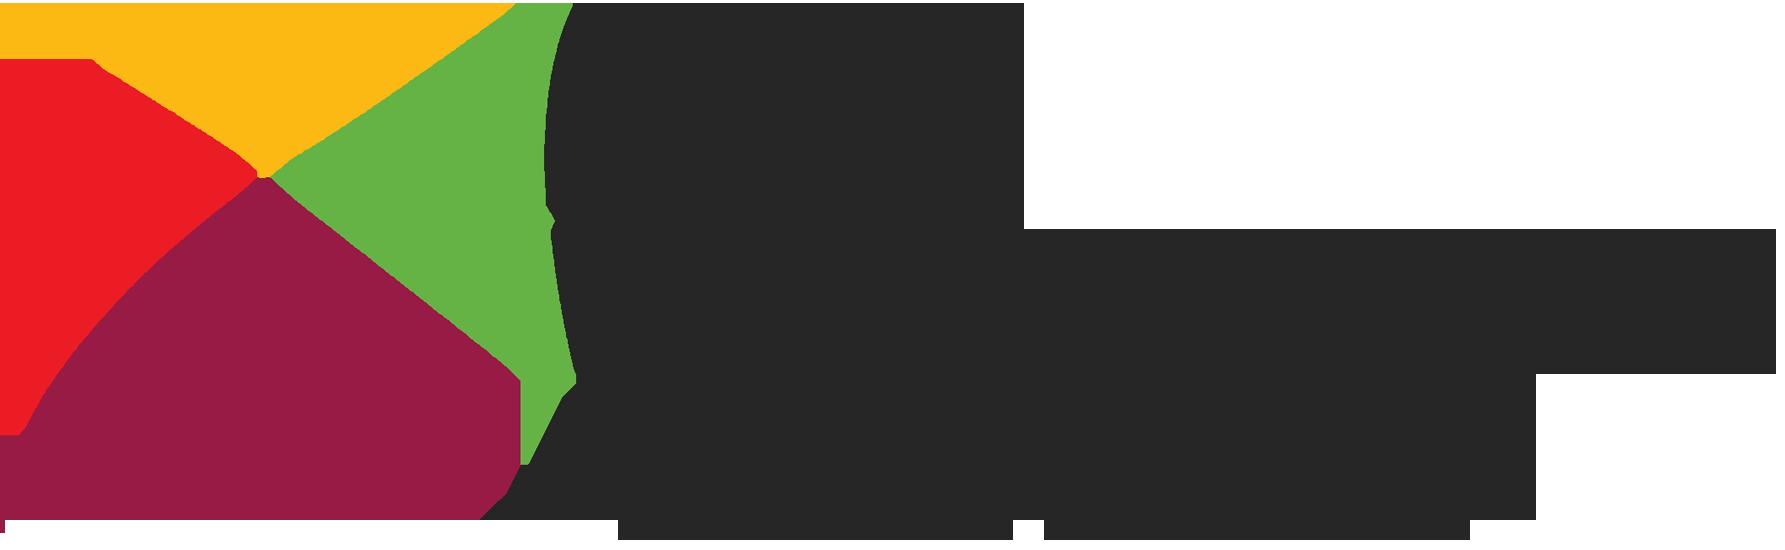 Kite Bangladesh Holidays logo